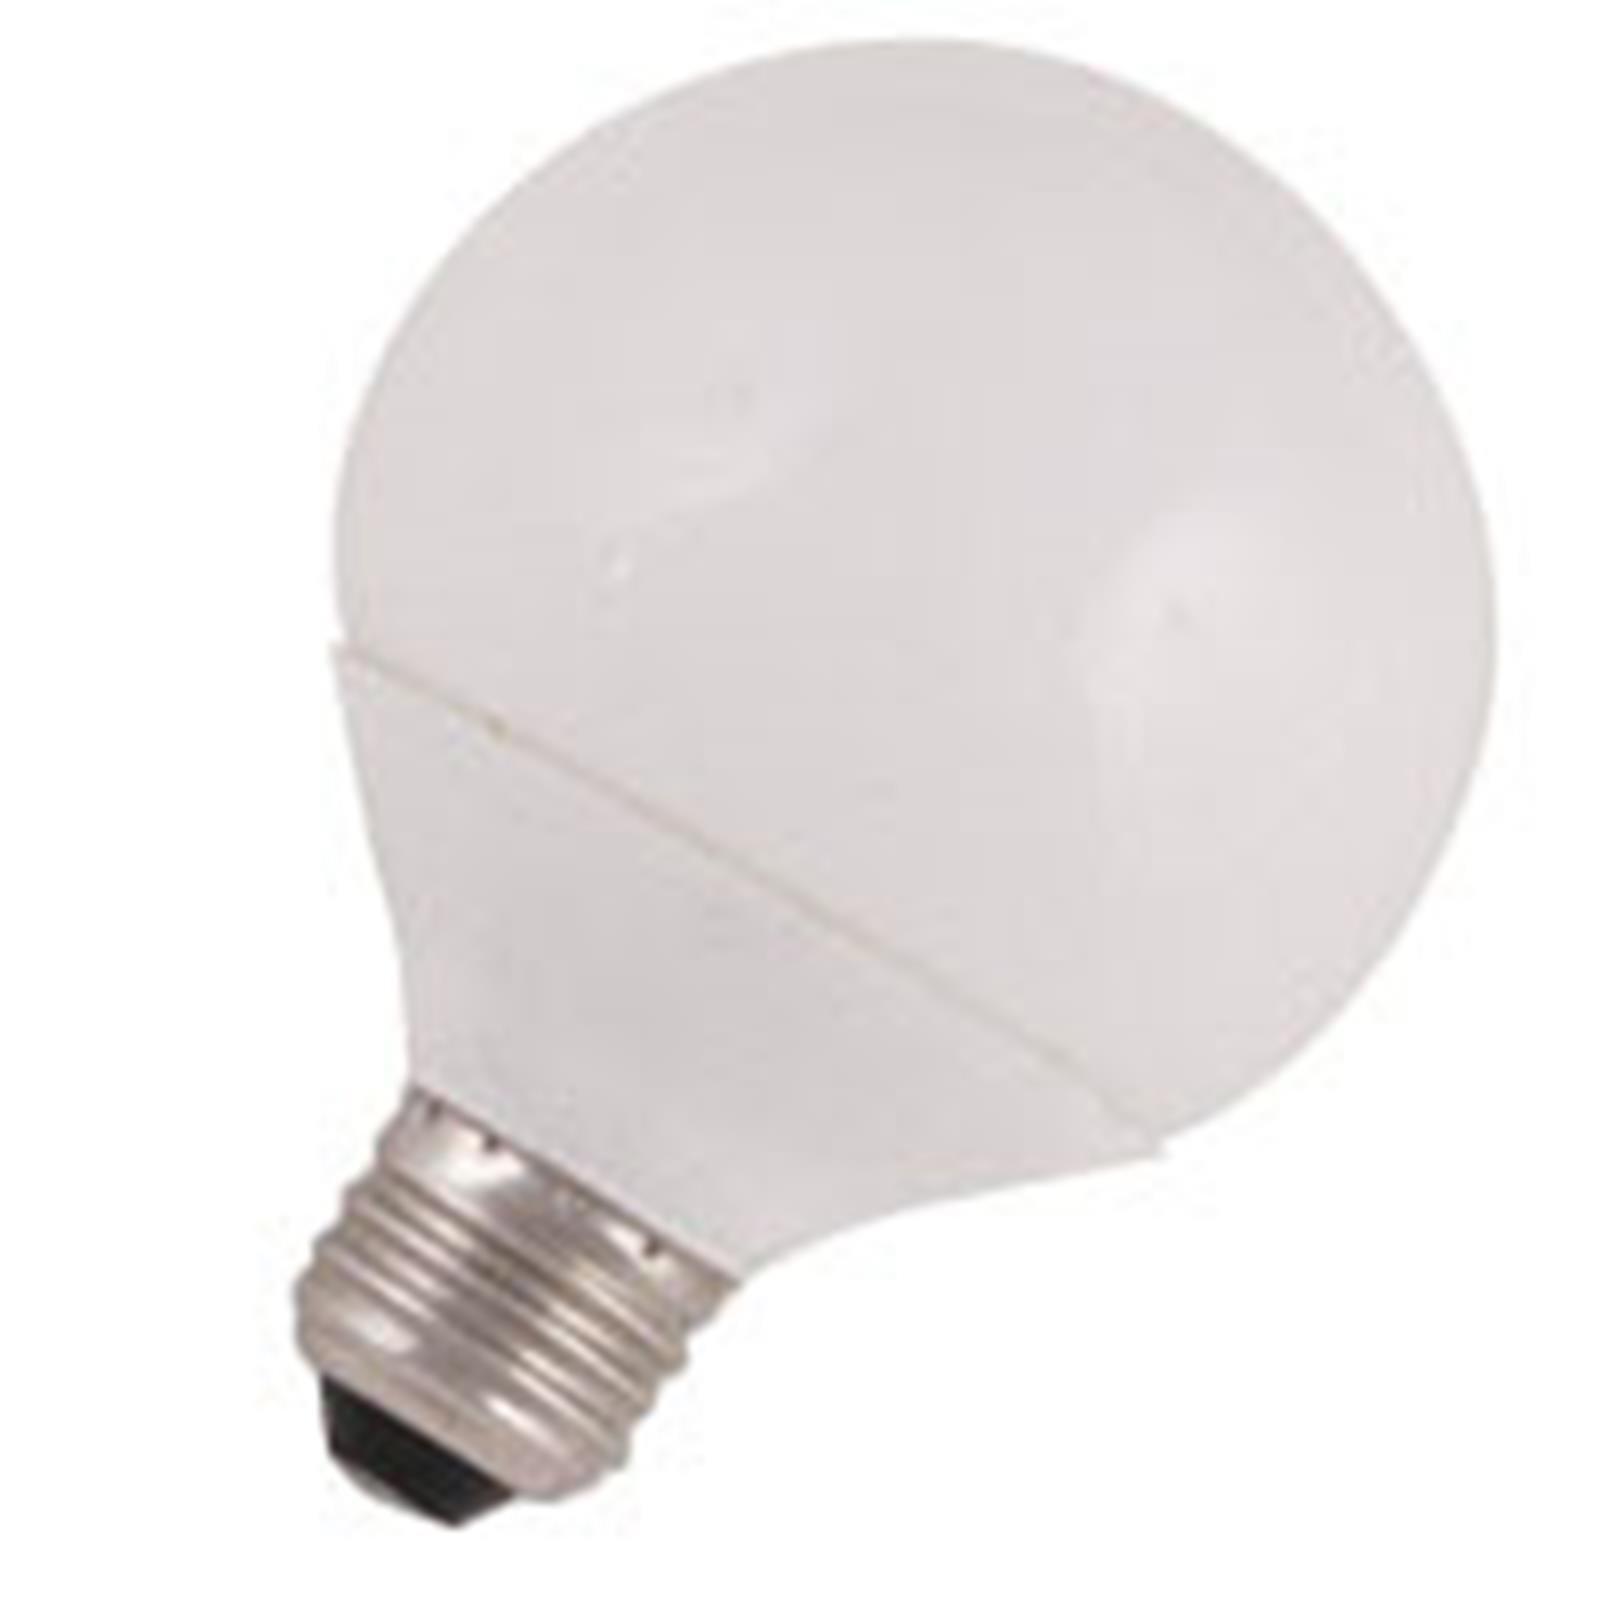 6 Qty. Halco 15W Spiral G28 2700K Med ProLume CFL15/27/G28 15w 120v CFL Warm White Lamp Bulb